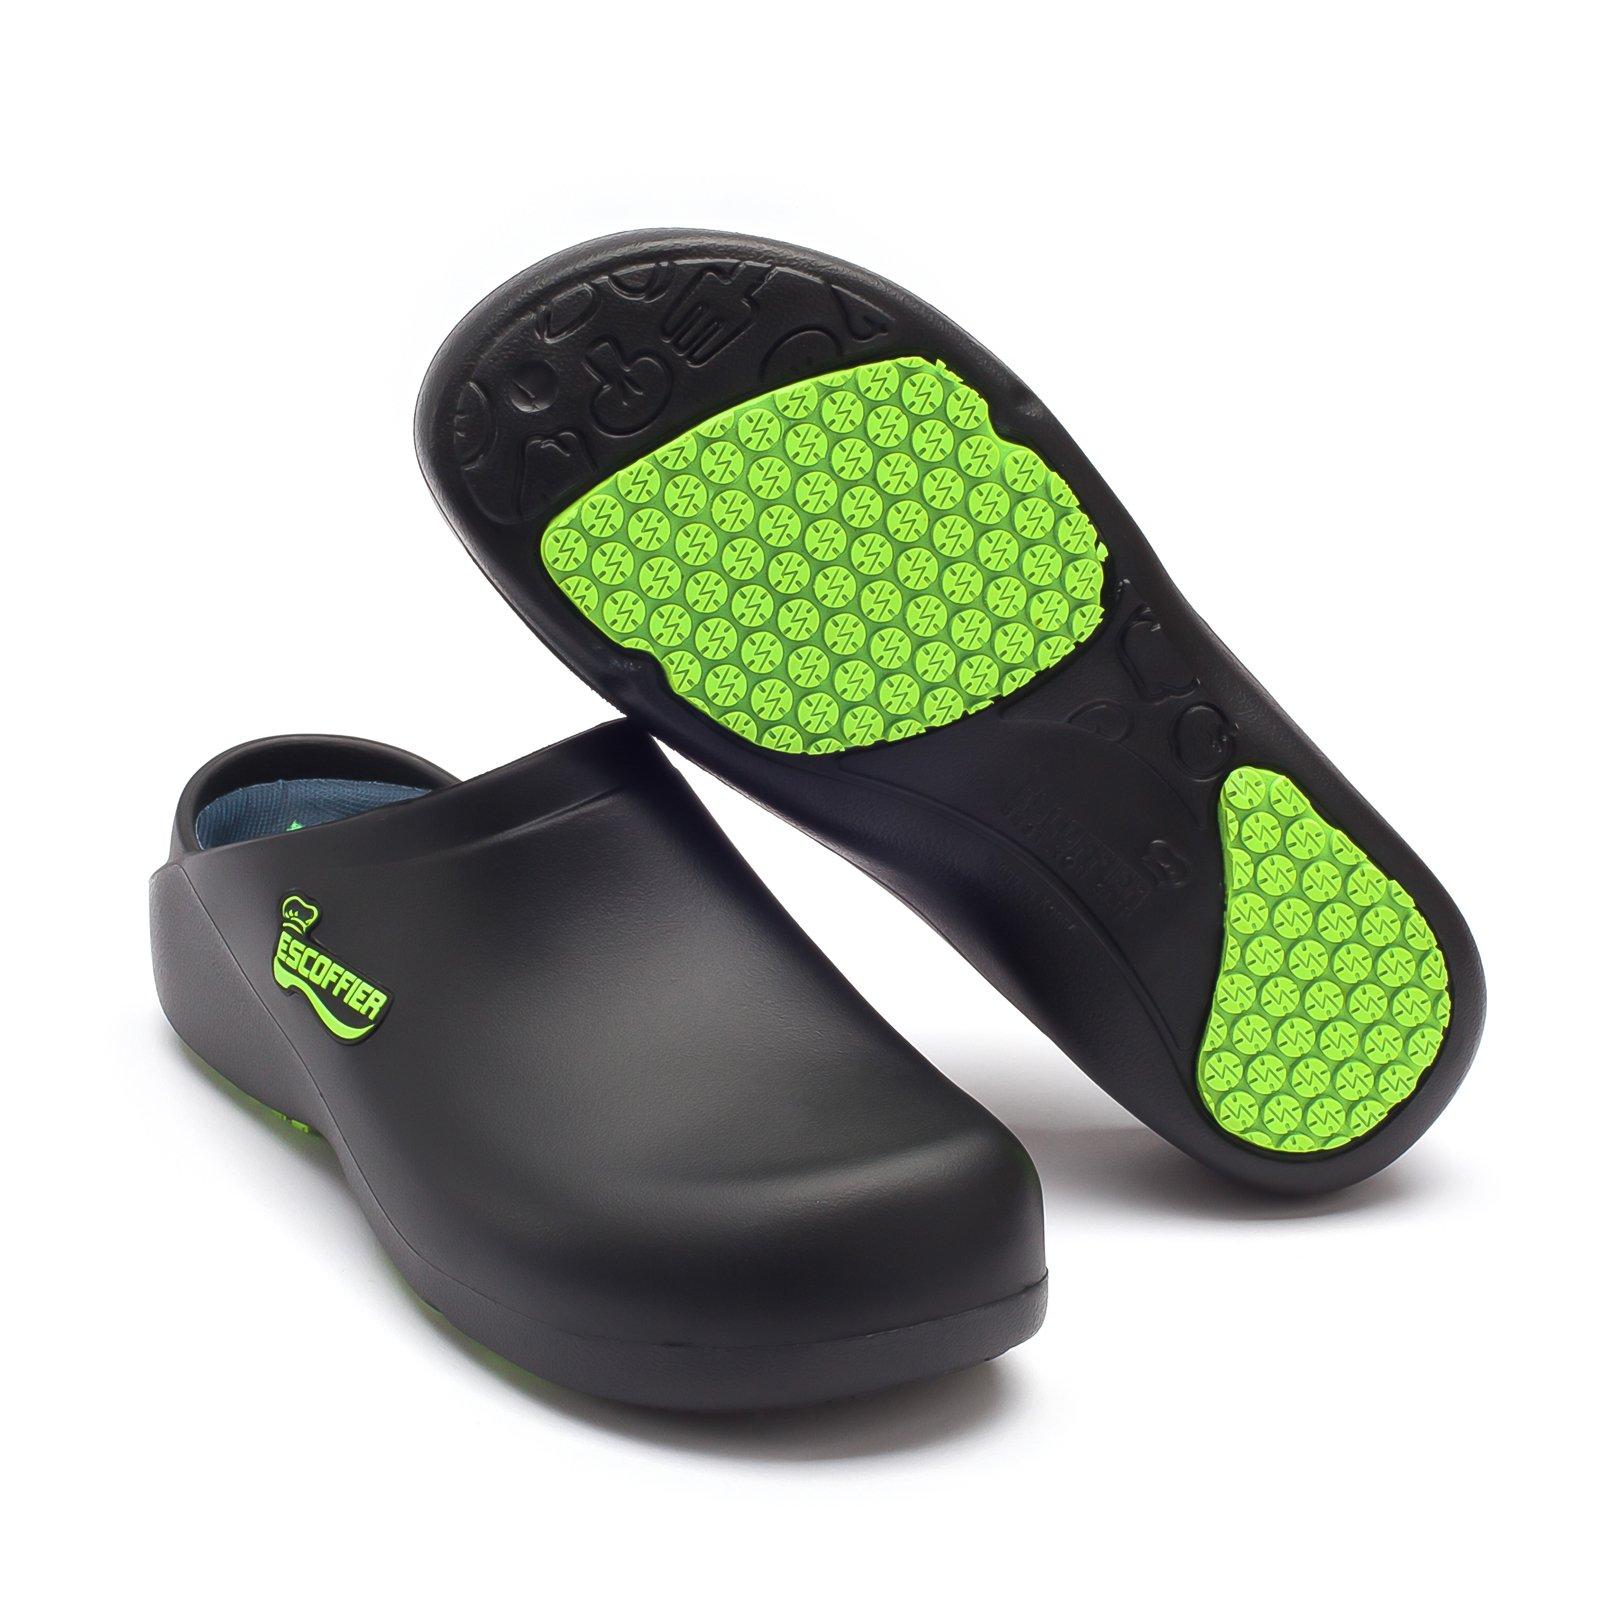 ESCOFFIER 防水防滑厨房厨师洞洞鞋 - 男女通用防滑工作泥鞋